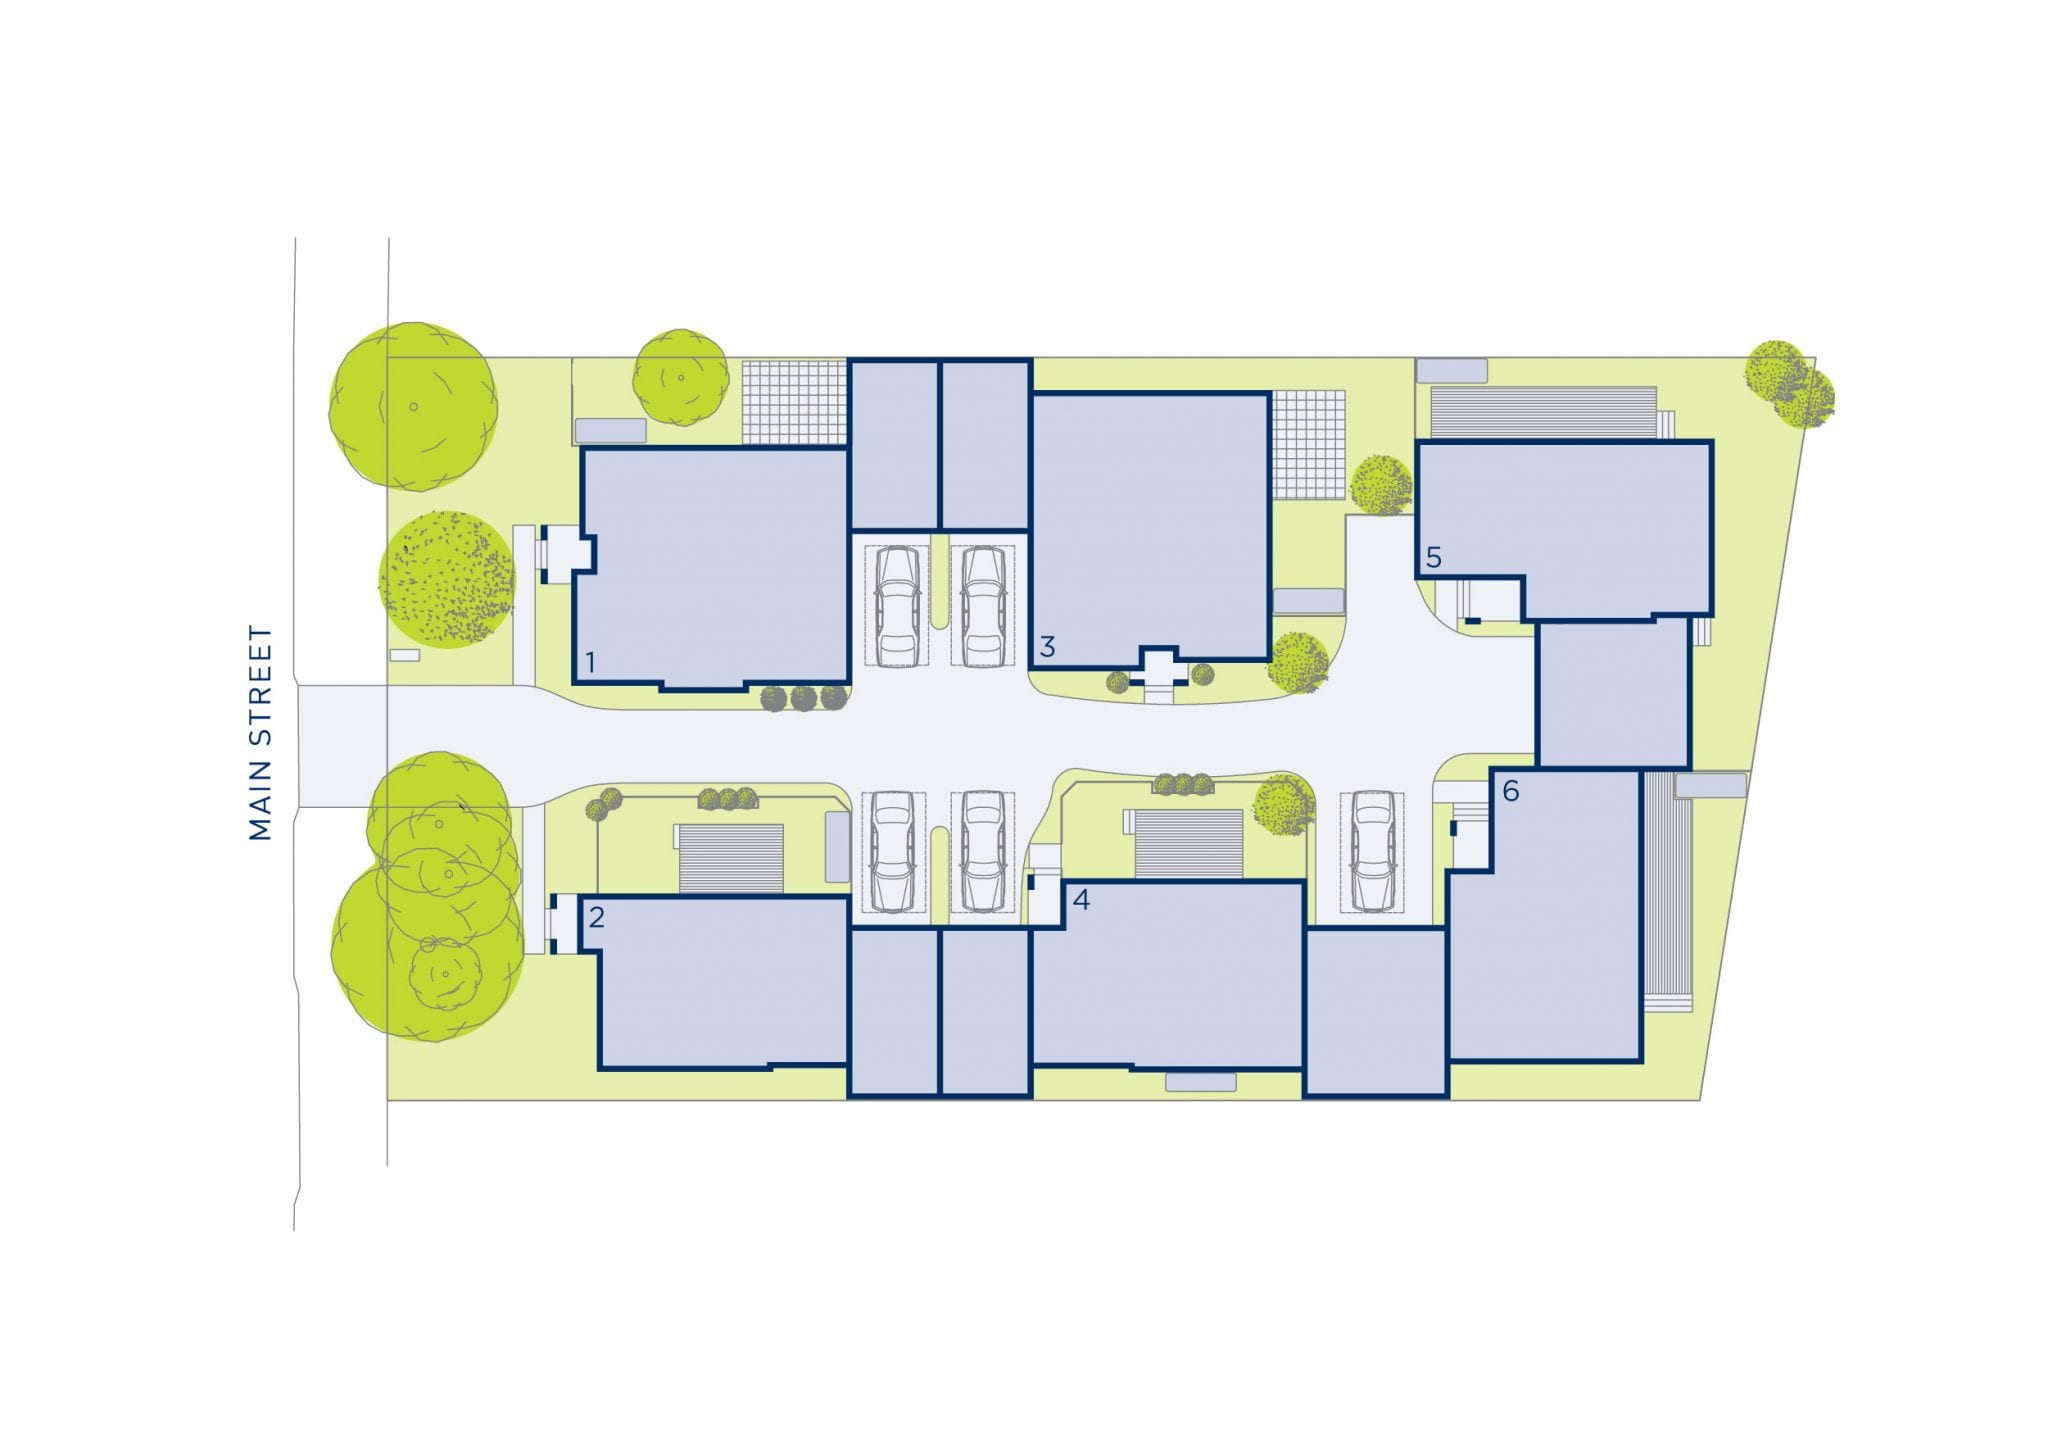 Plan of Mulberry custom home design at St. Rosebud West